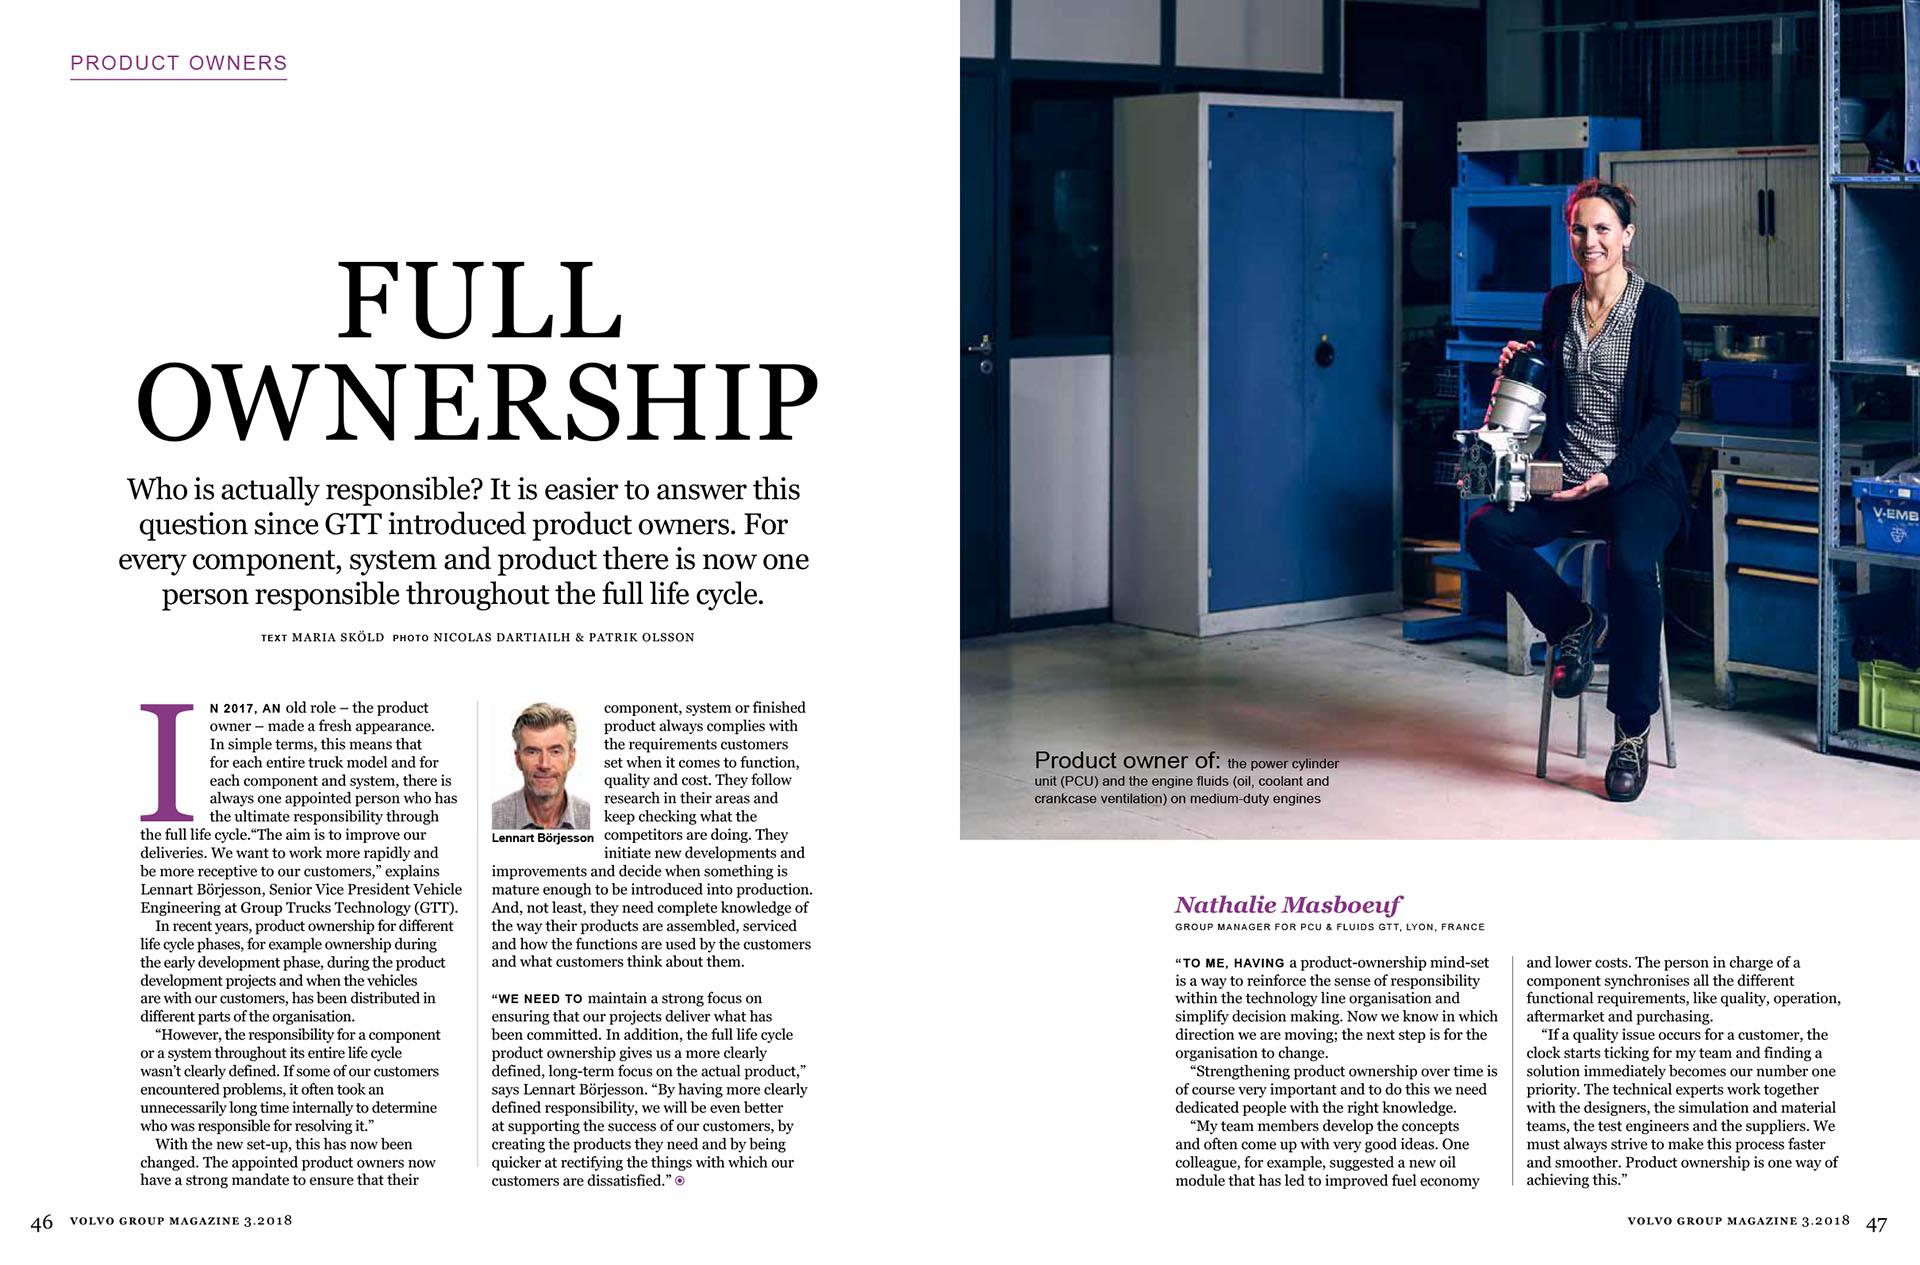 Volvo Group Magazine #3 - Full Ownership - juillet 2018